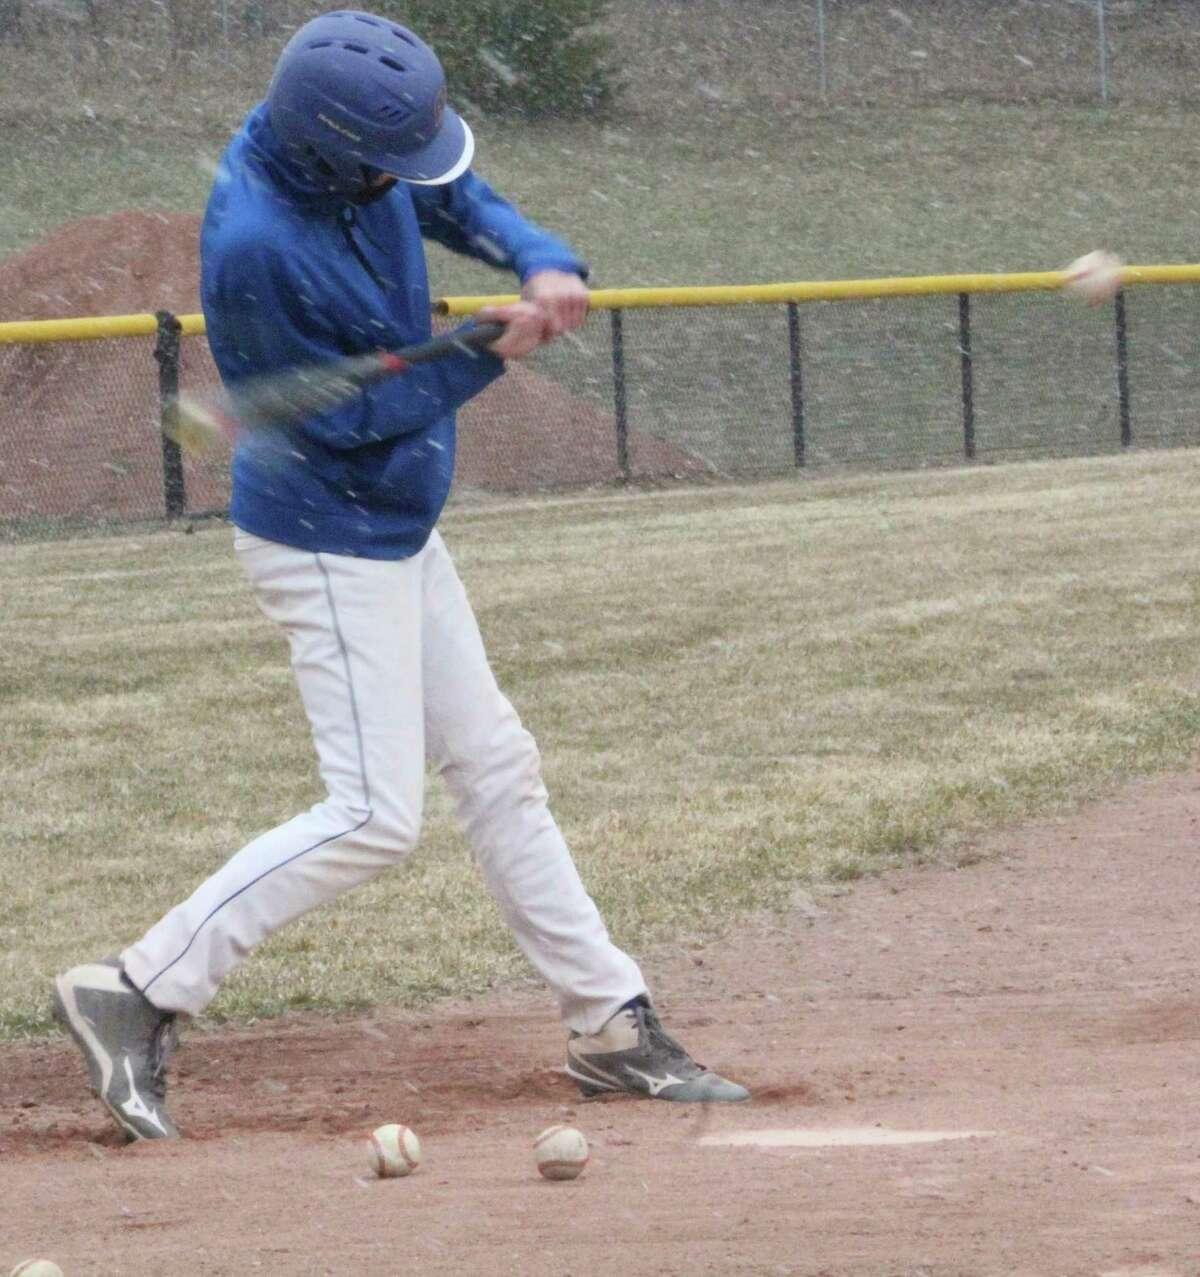 Evart's Pierce Johnson works on his hitting at a practice earlier this season. (Pioneer file photo)